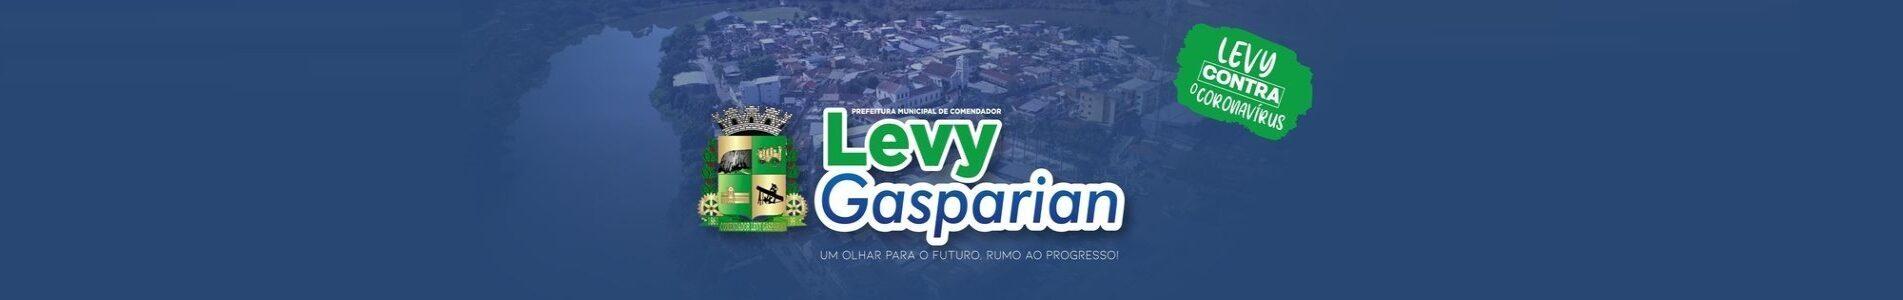 cropped-COMENDADOR-LEVY-GASPARIAN-1.jpg